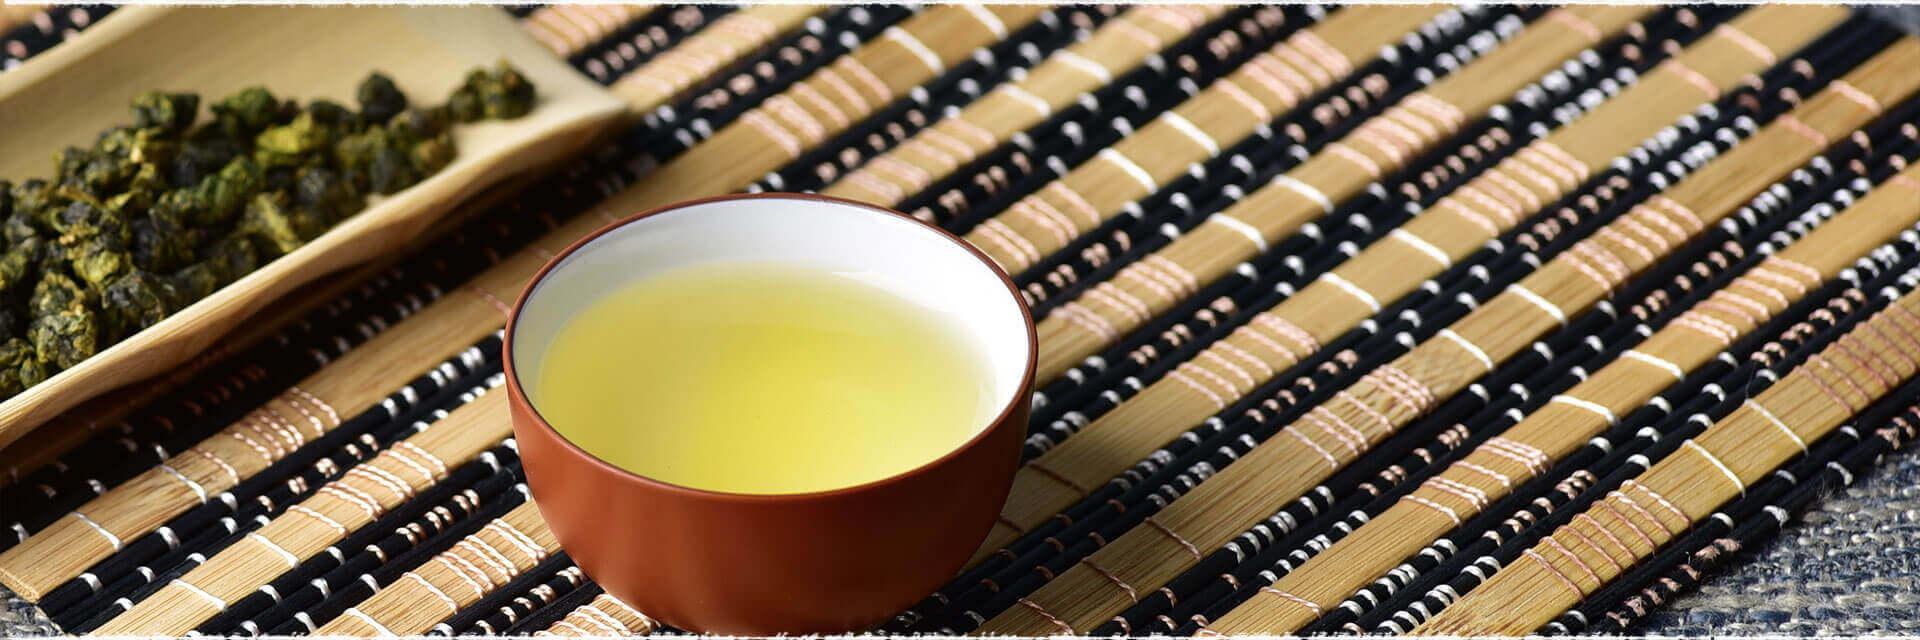 La fabrication du TieGuanYin, un Oolong de Chine.